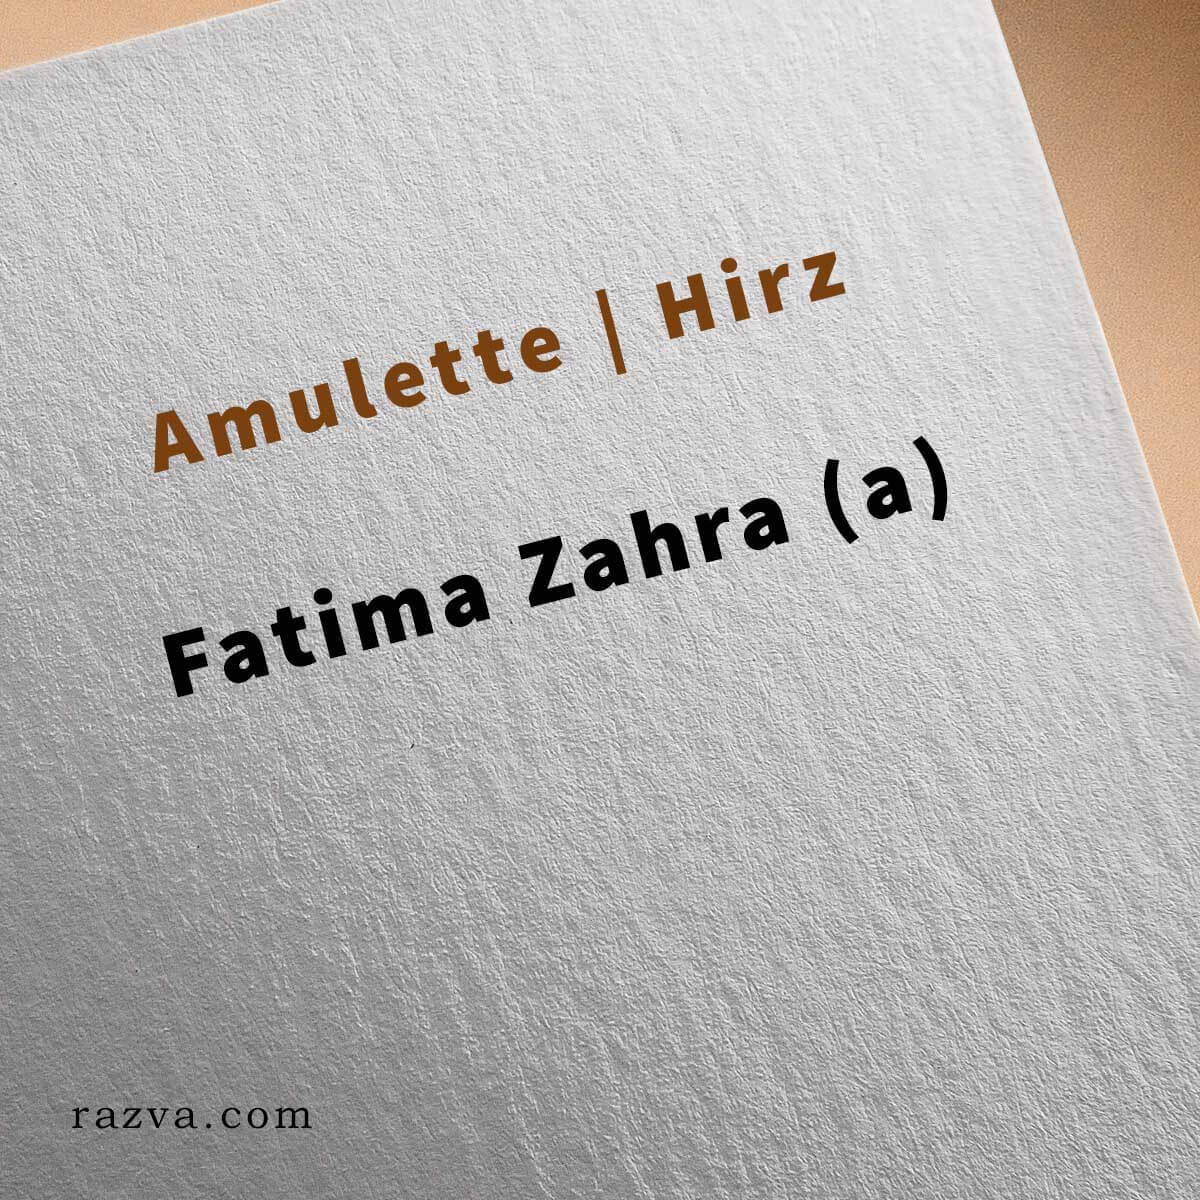 Amulette chiite Fatima Zahra (a)